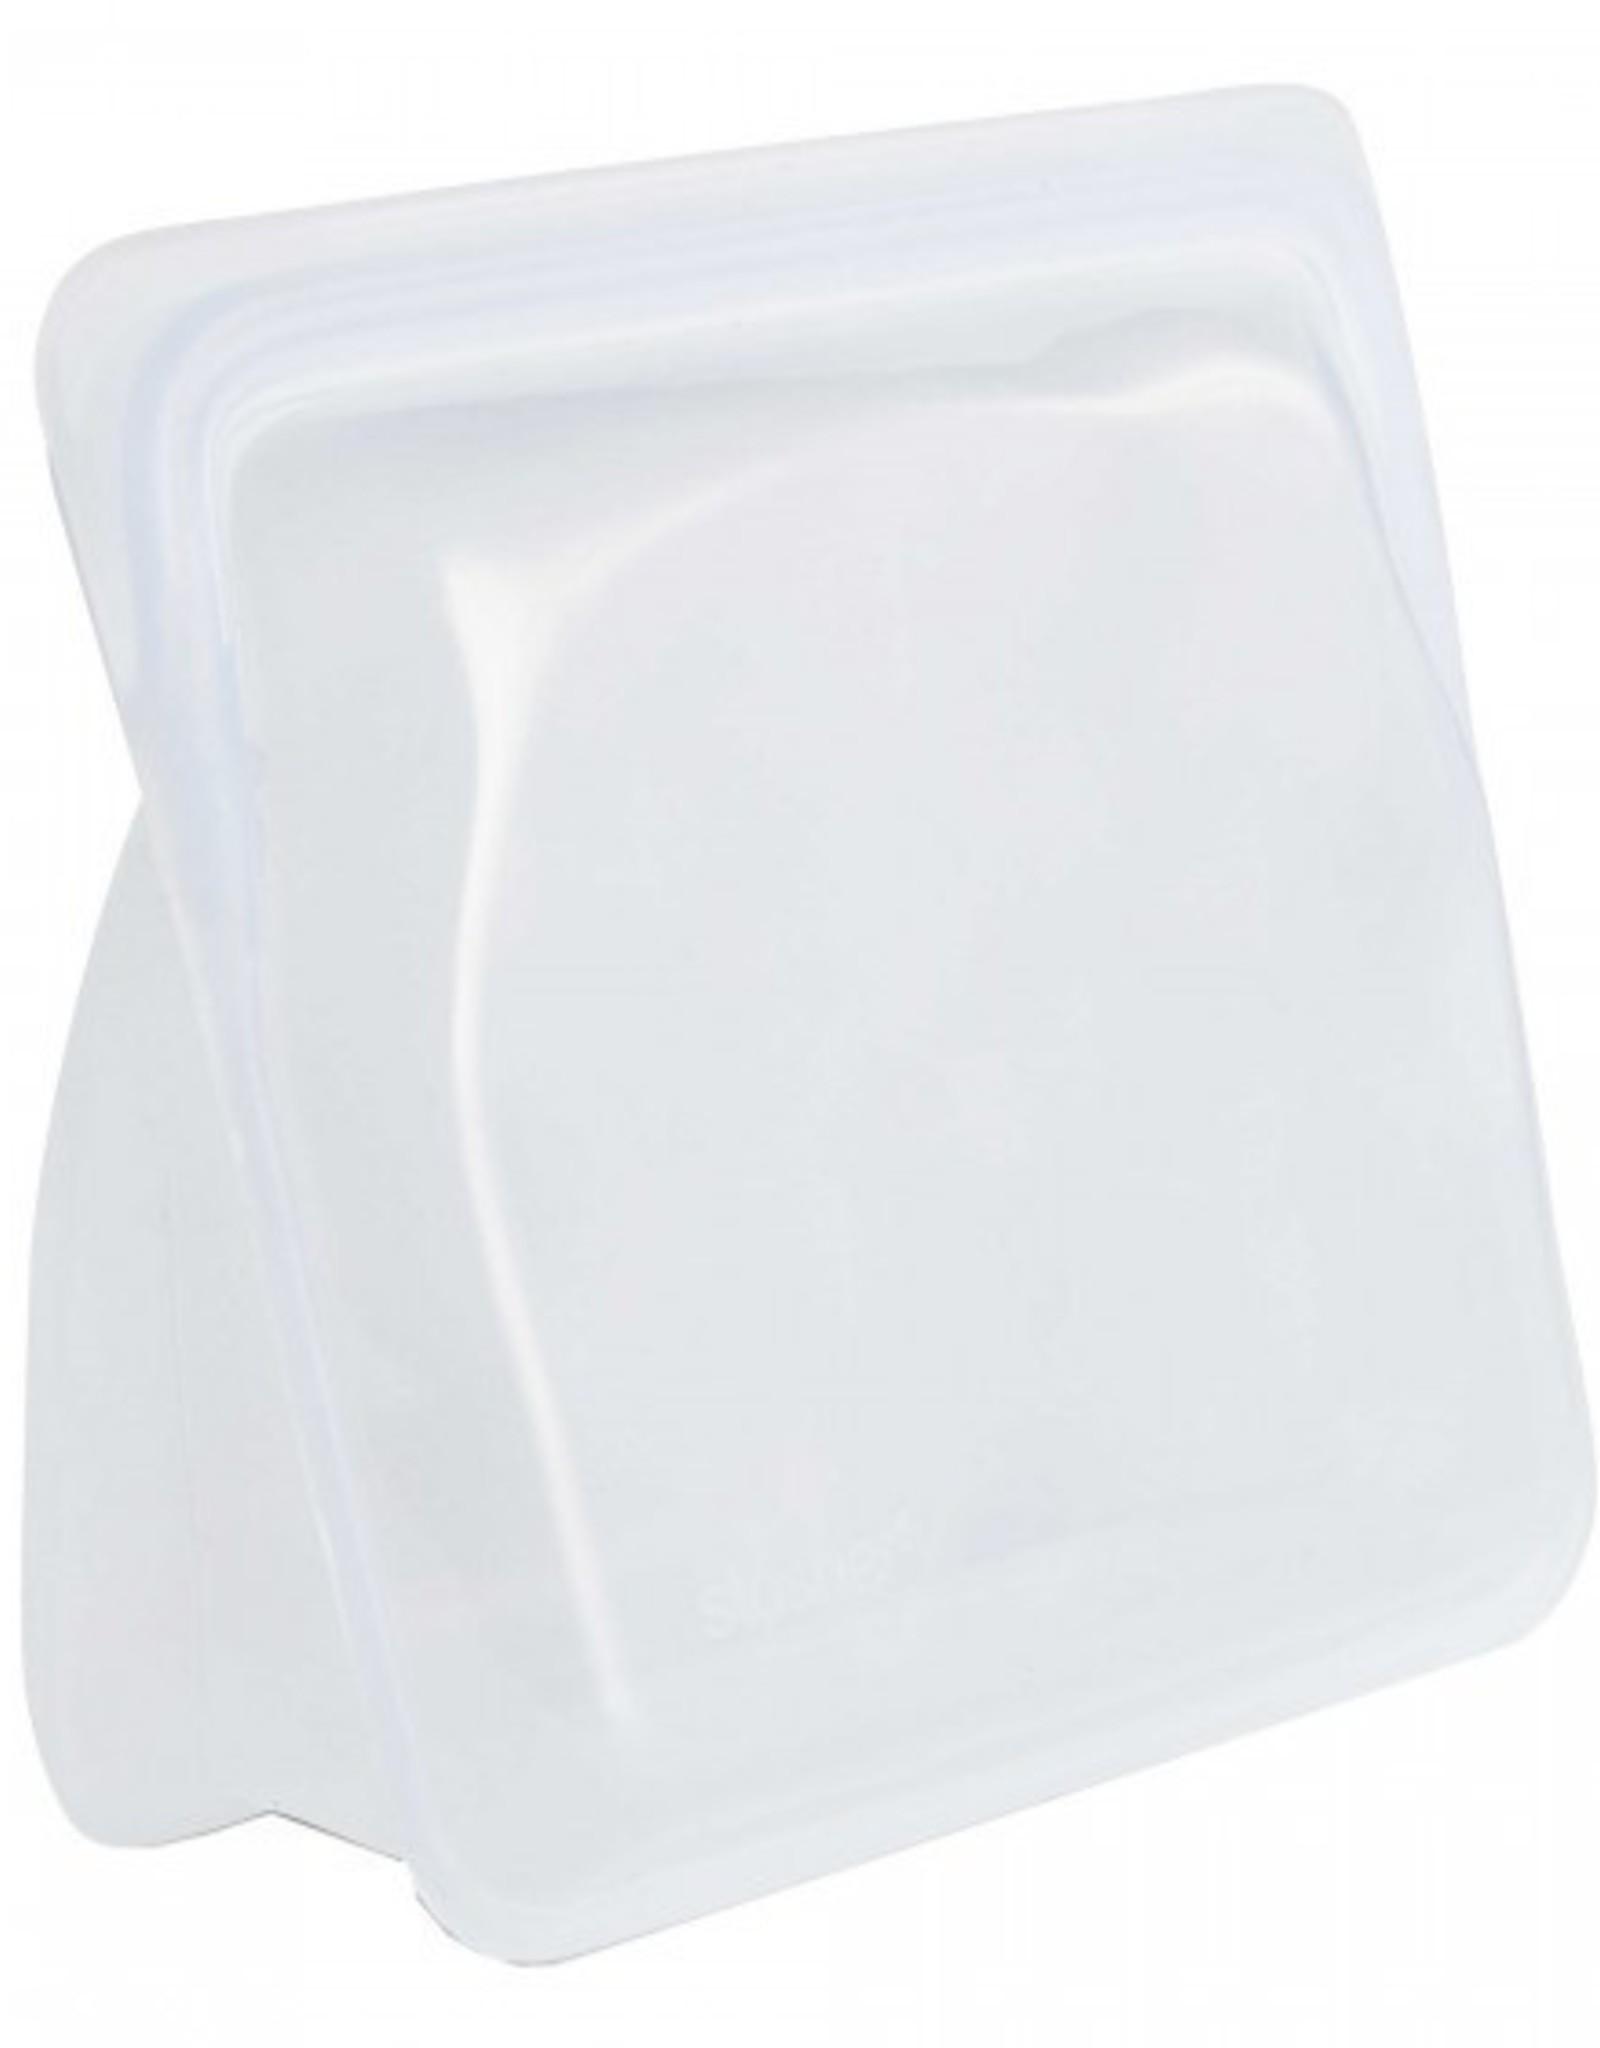 Stasher Bag Stasher stand-up bag - Clear